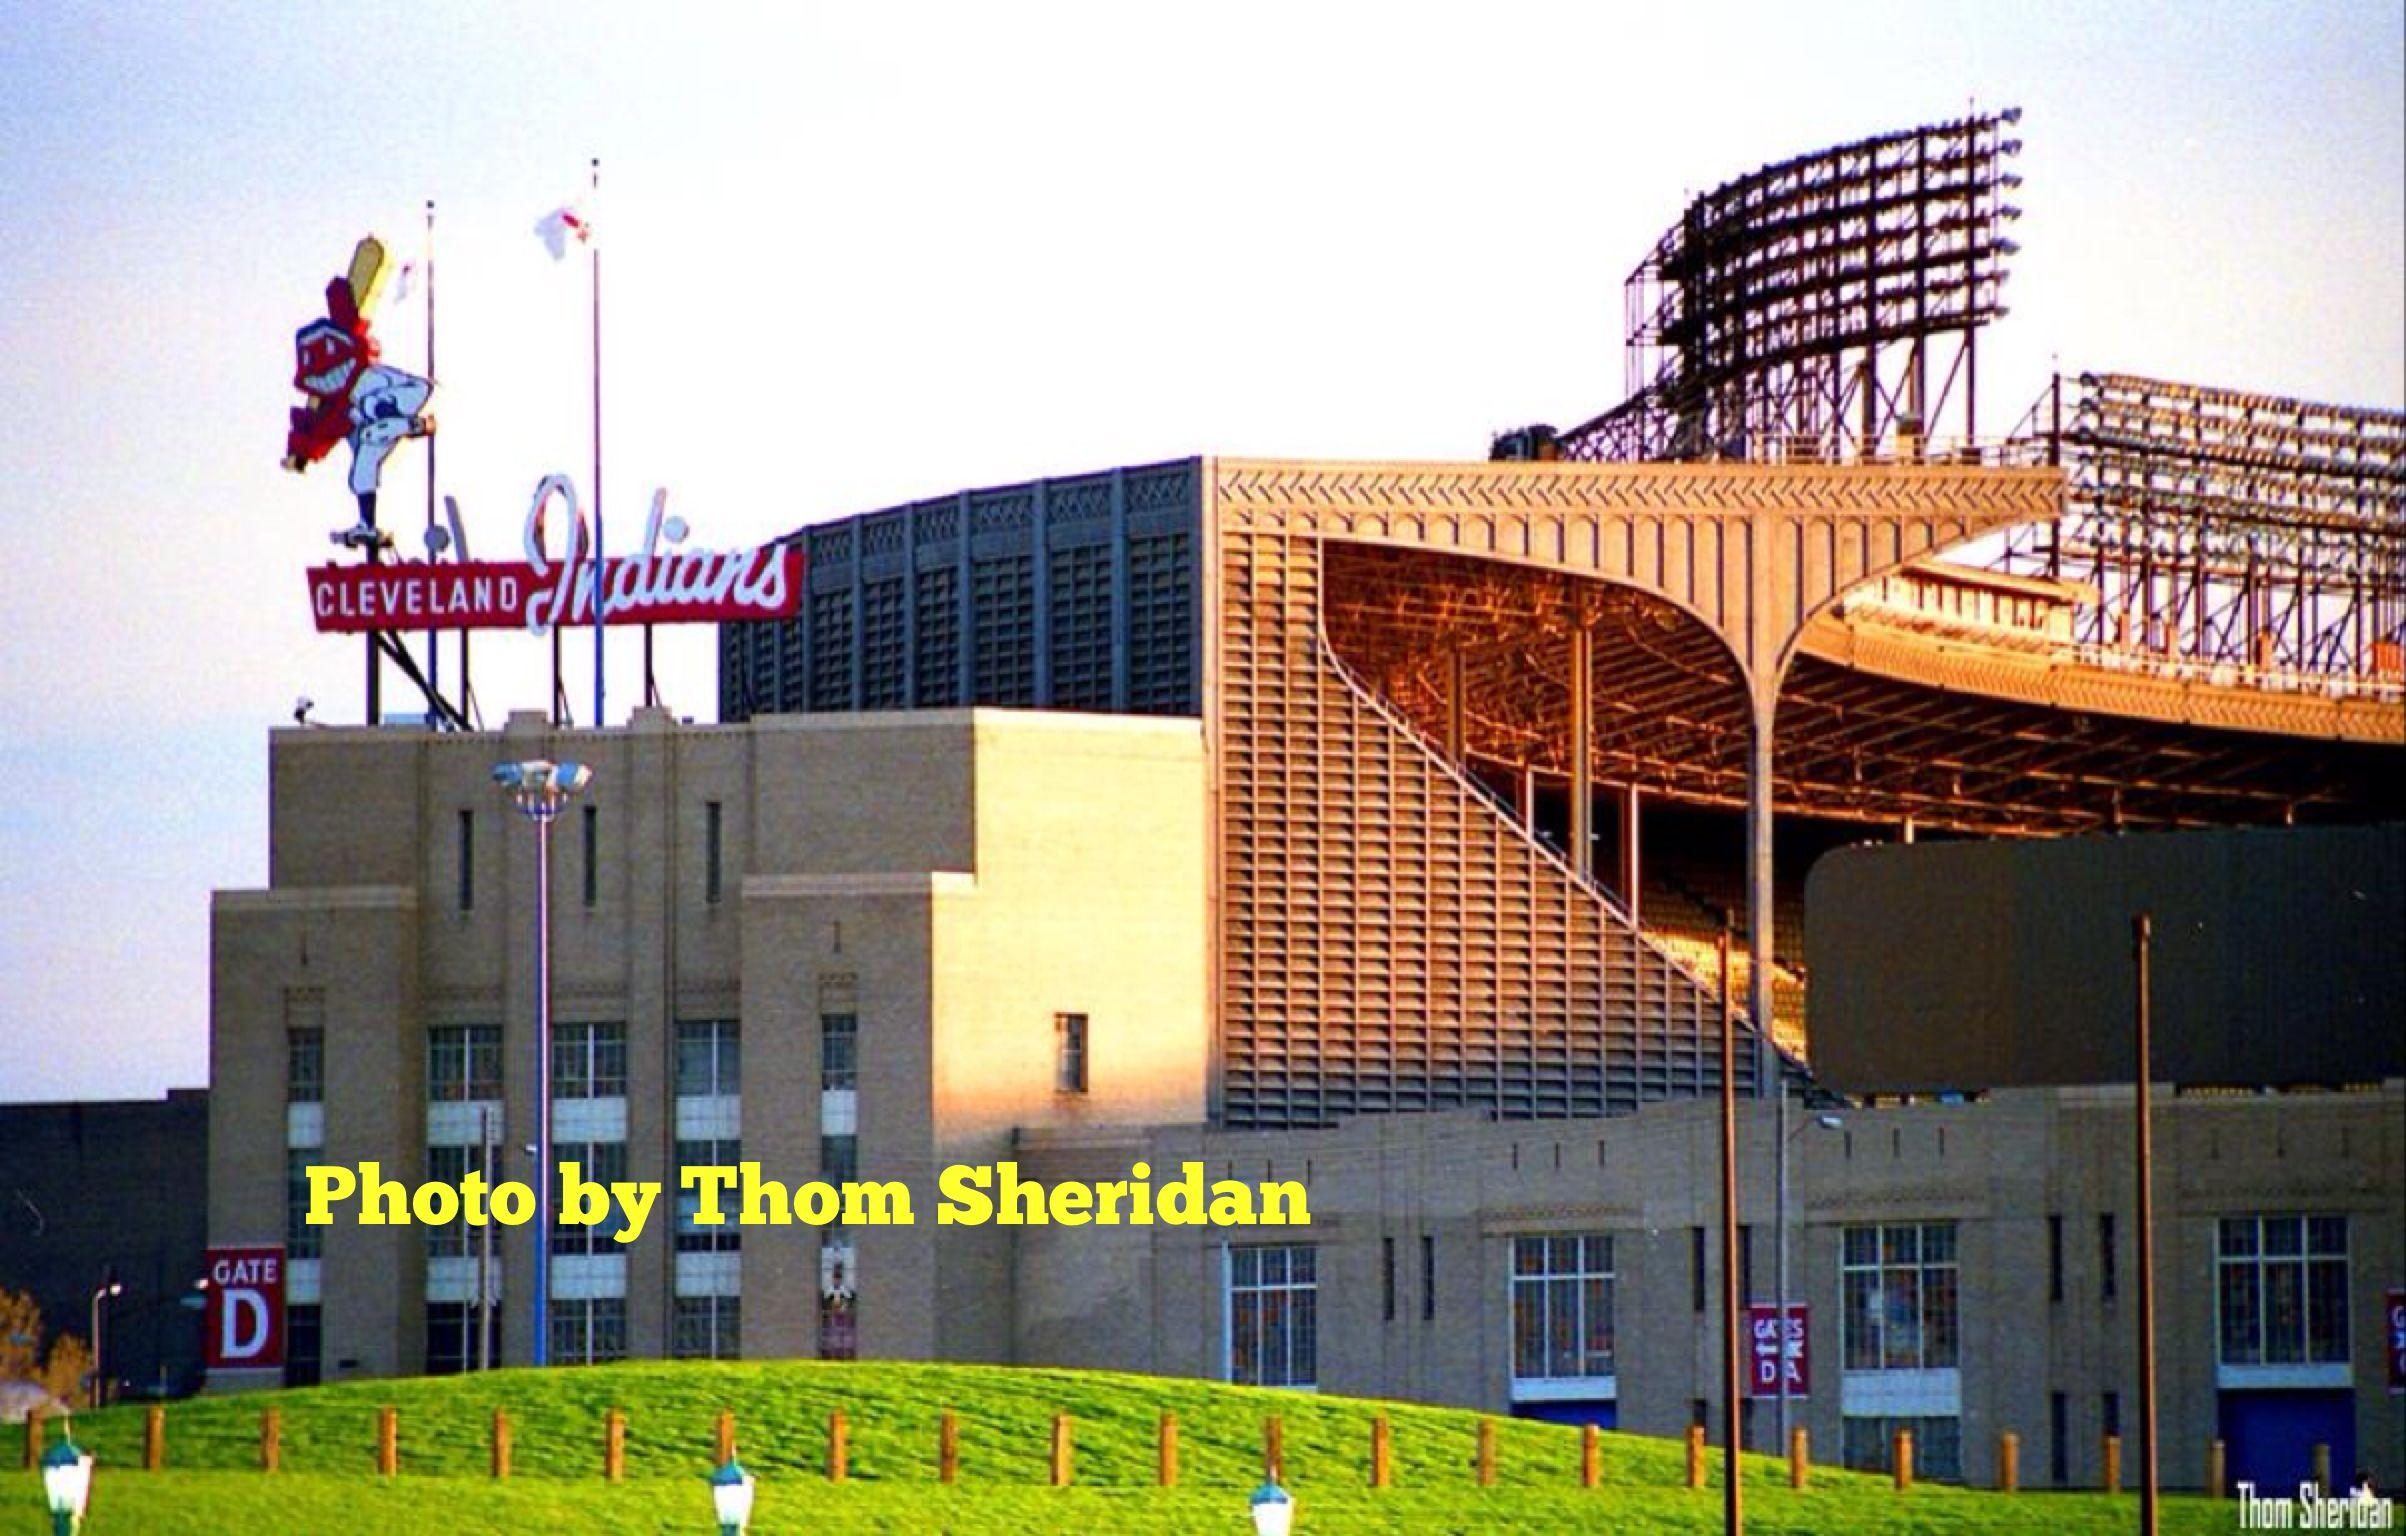 Cleveland municipal stadium the old stomping ground